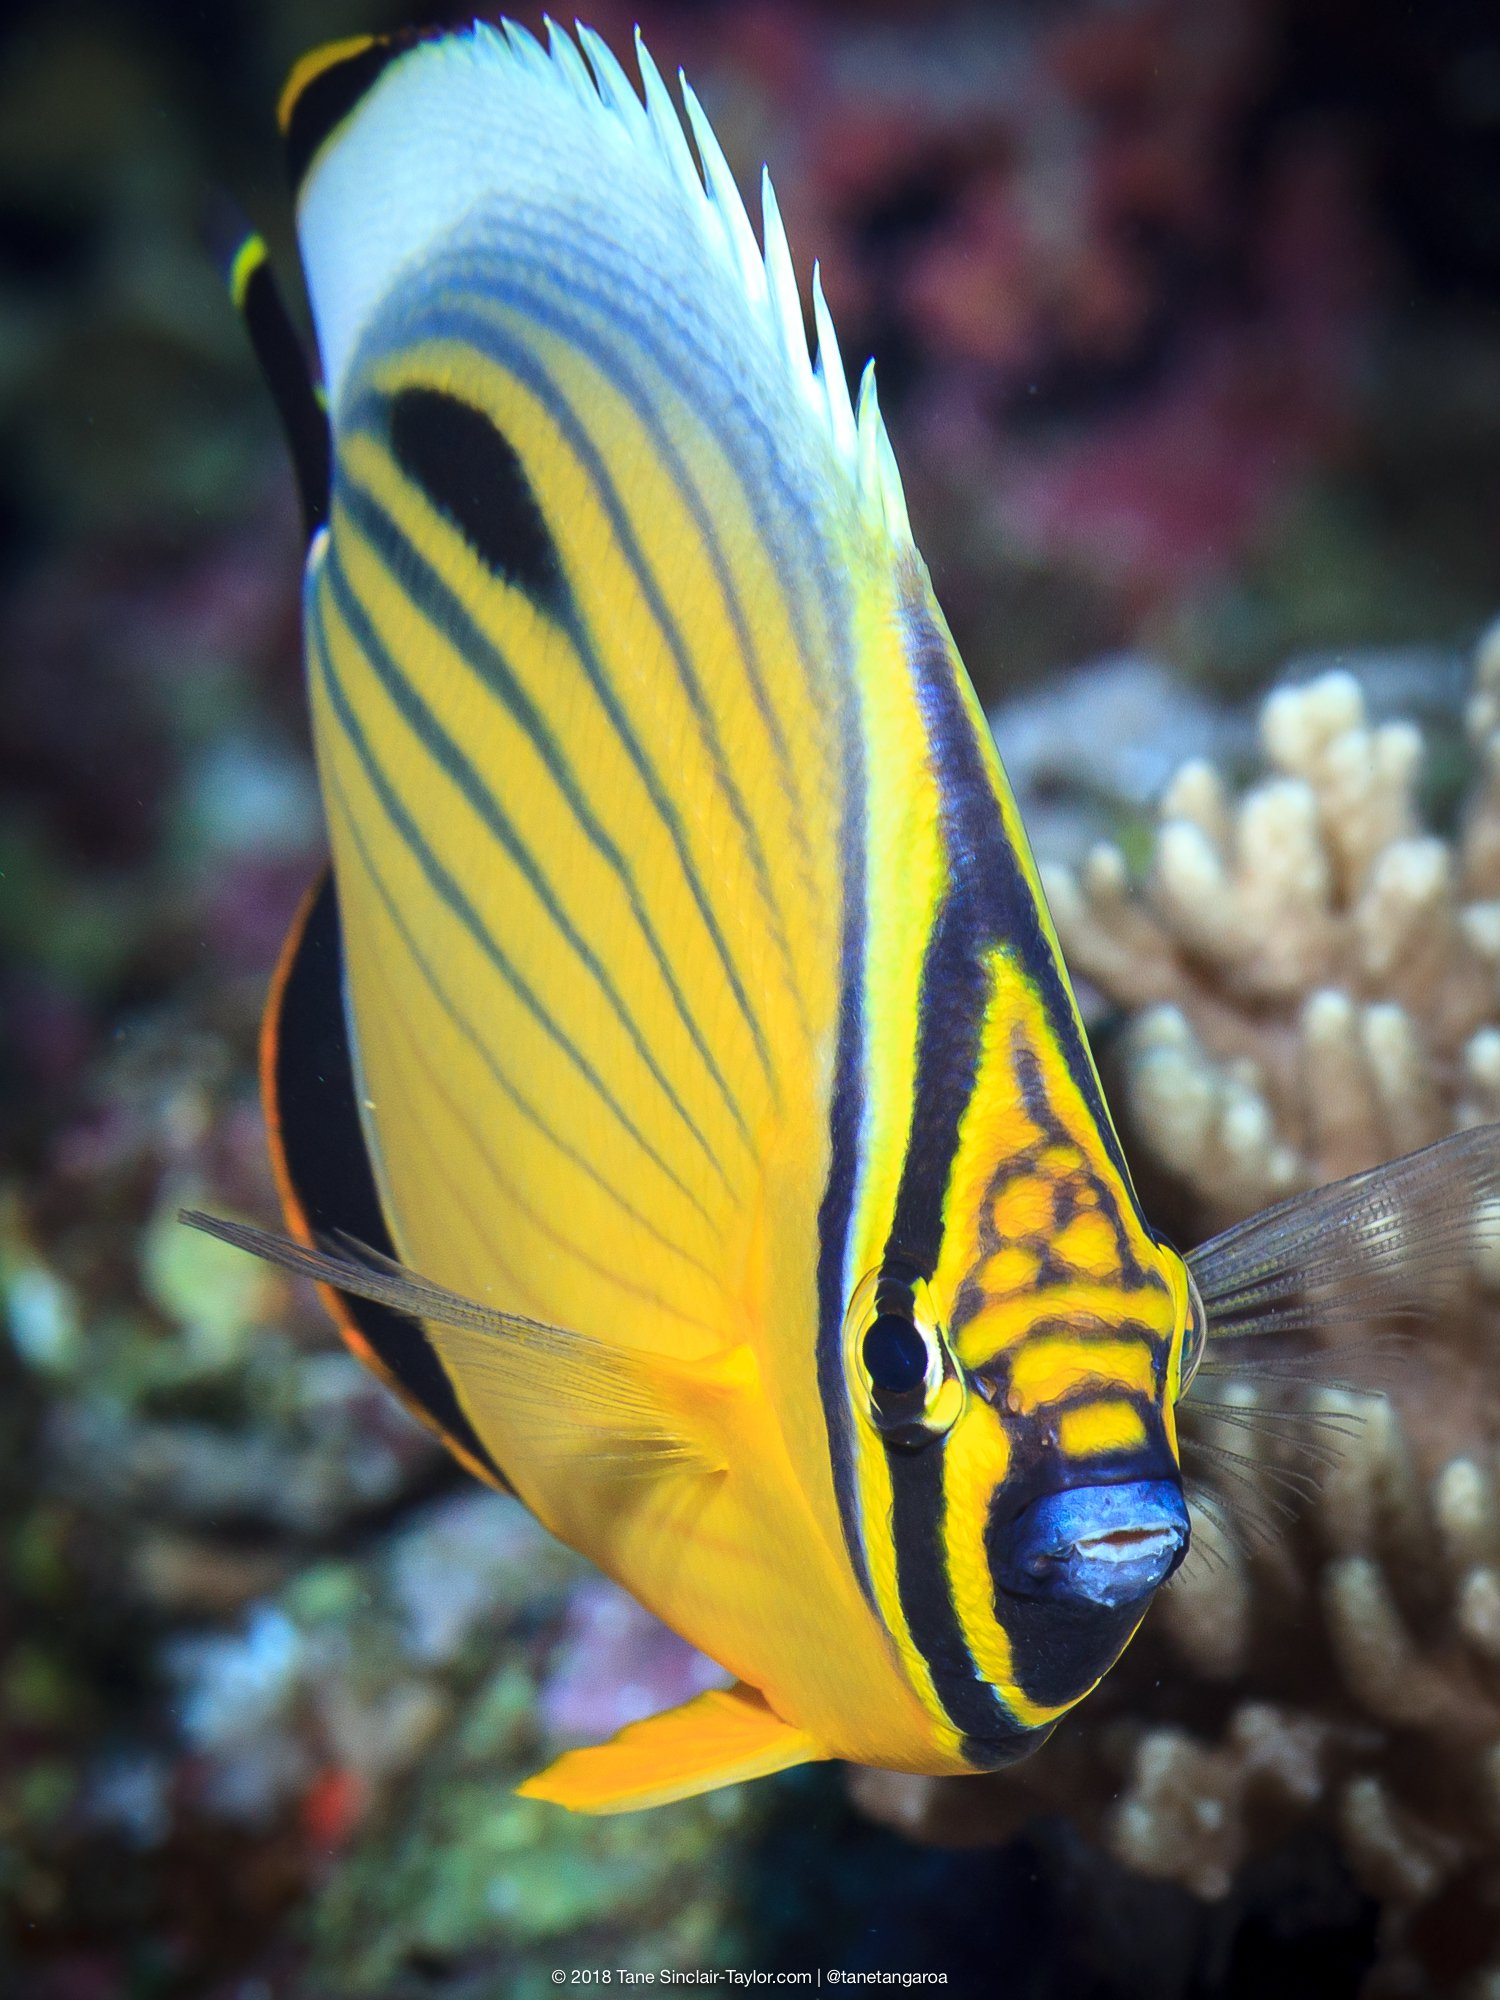 Blacktail butterflyfish (Chaetodon austriacus)